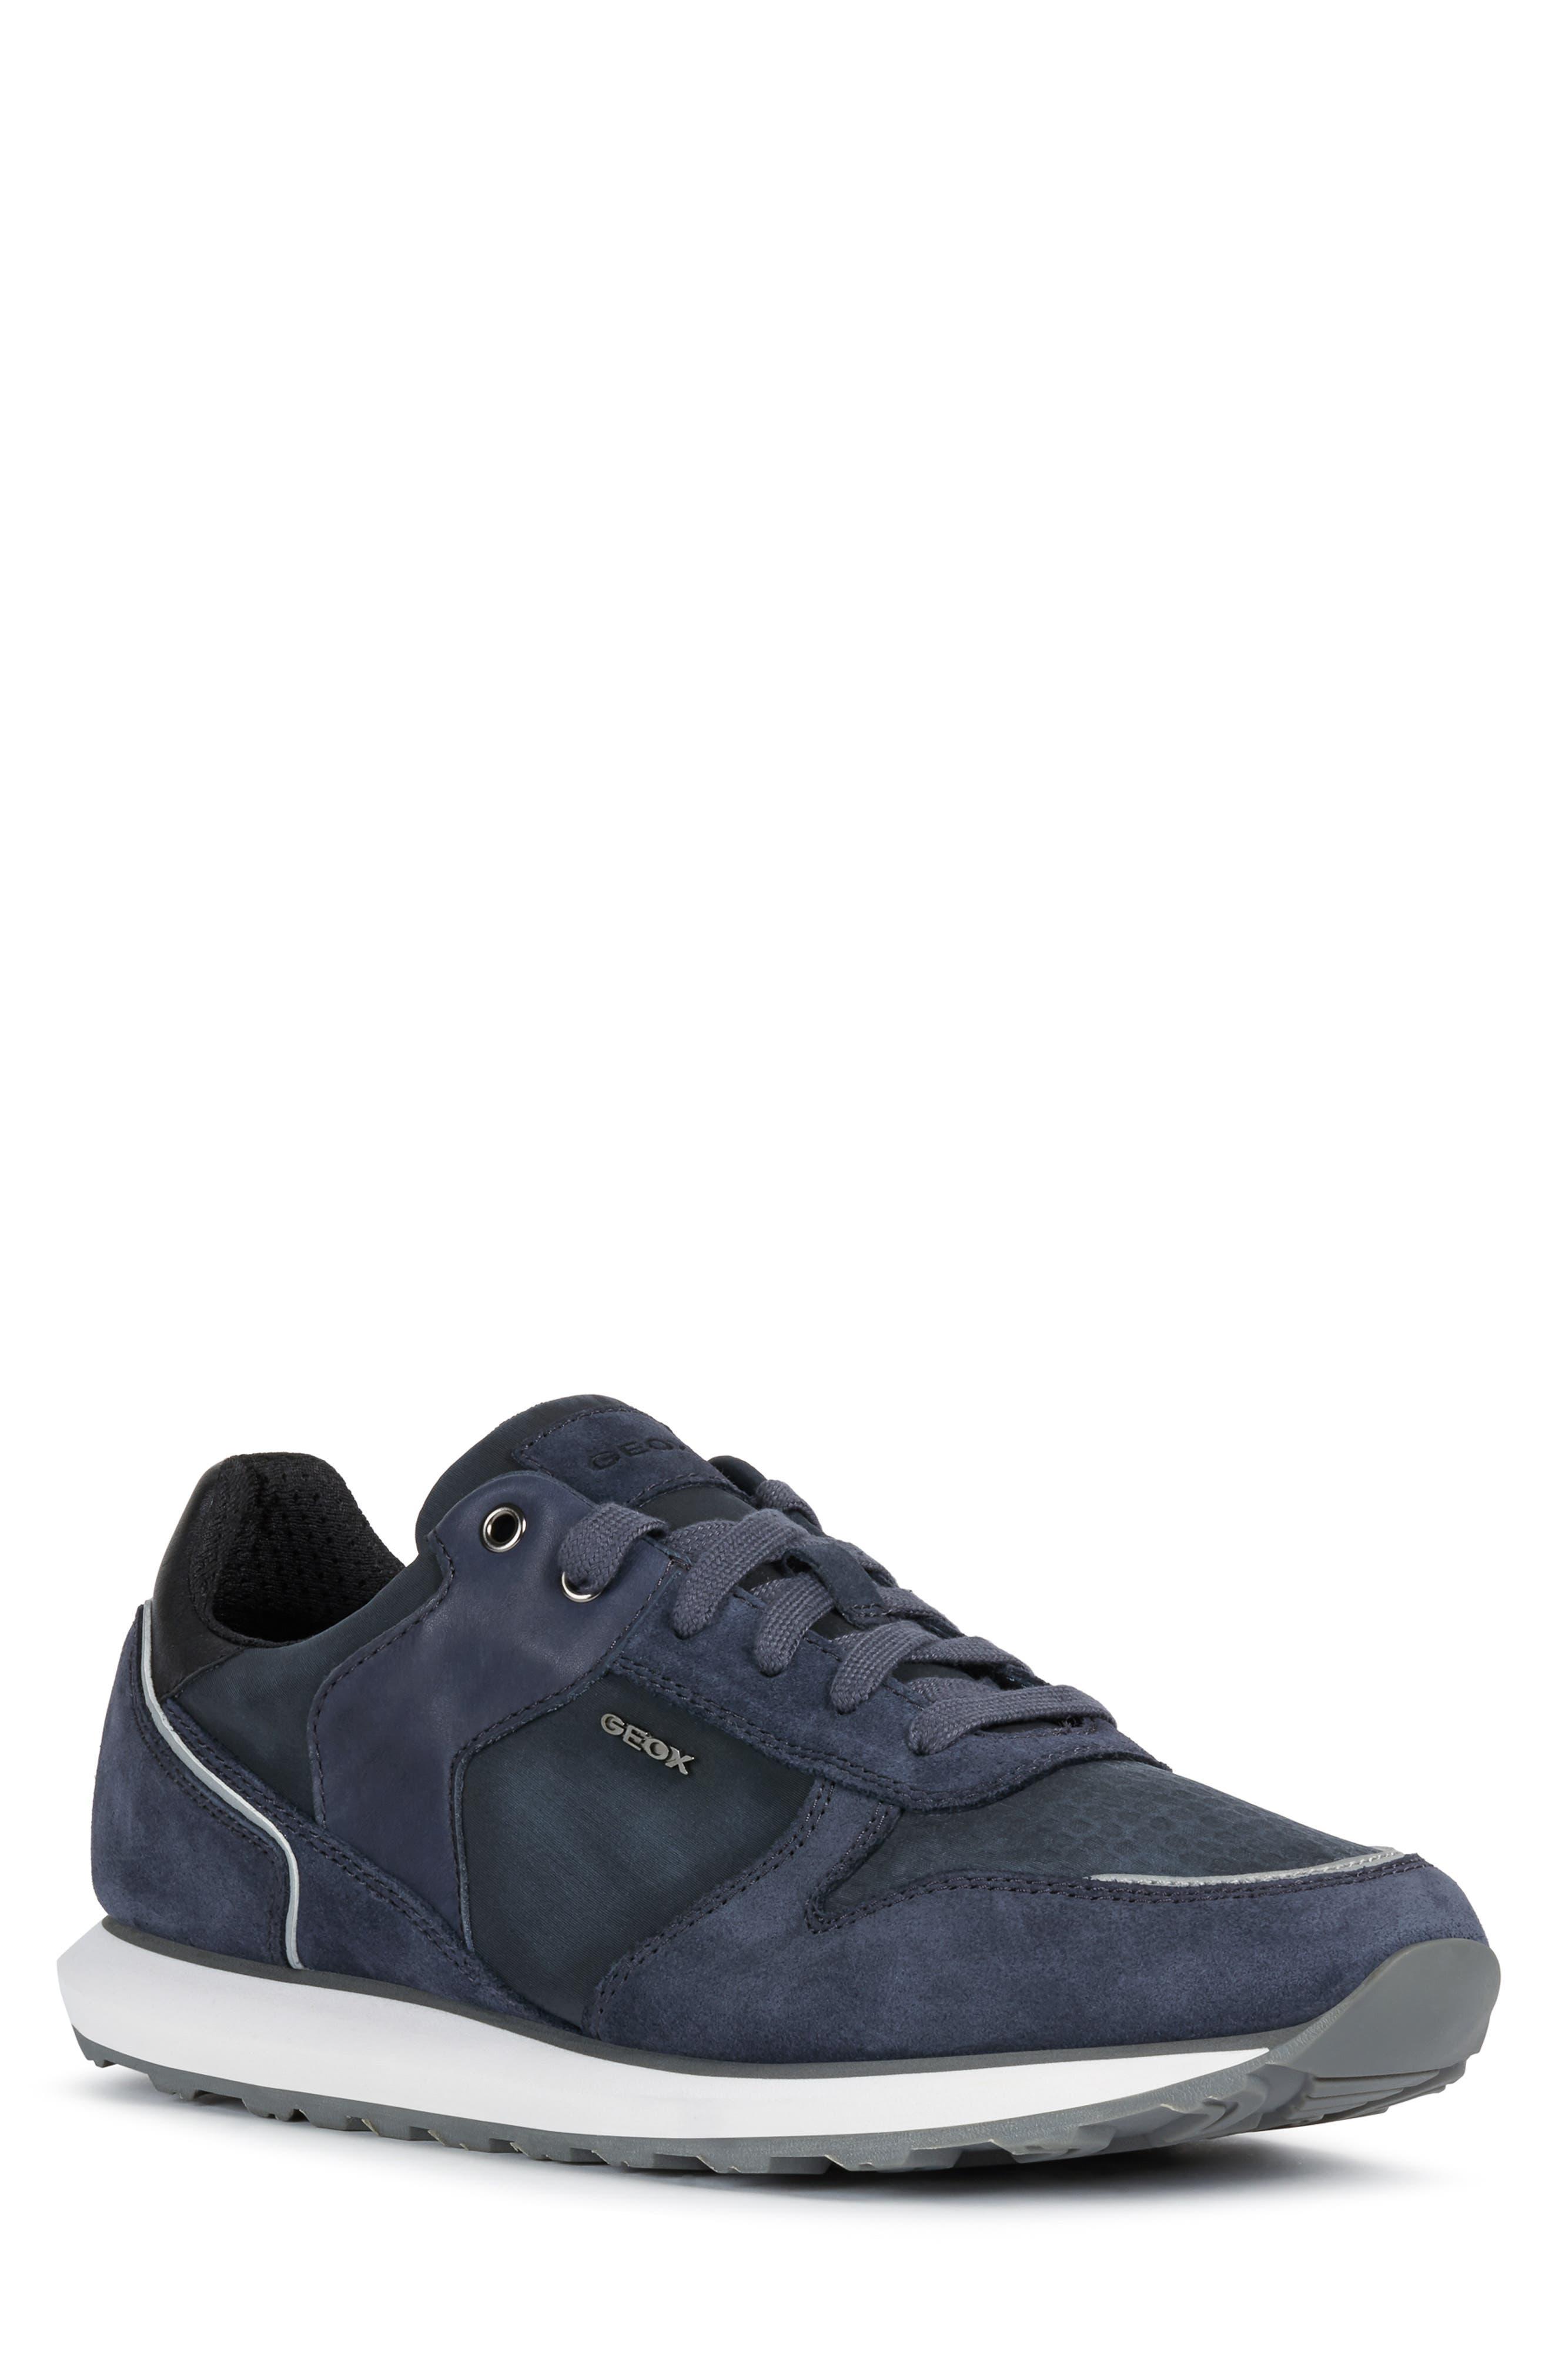 Men's Geox Sneakers, Athletic & Running Shoes | Nordstrom